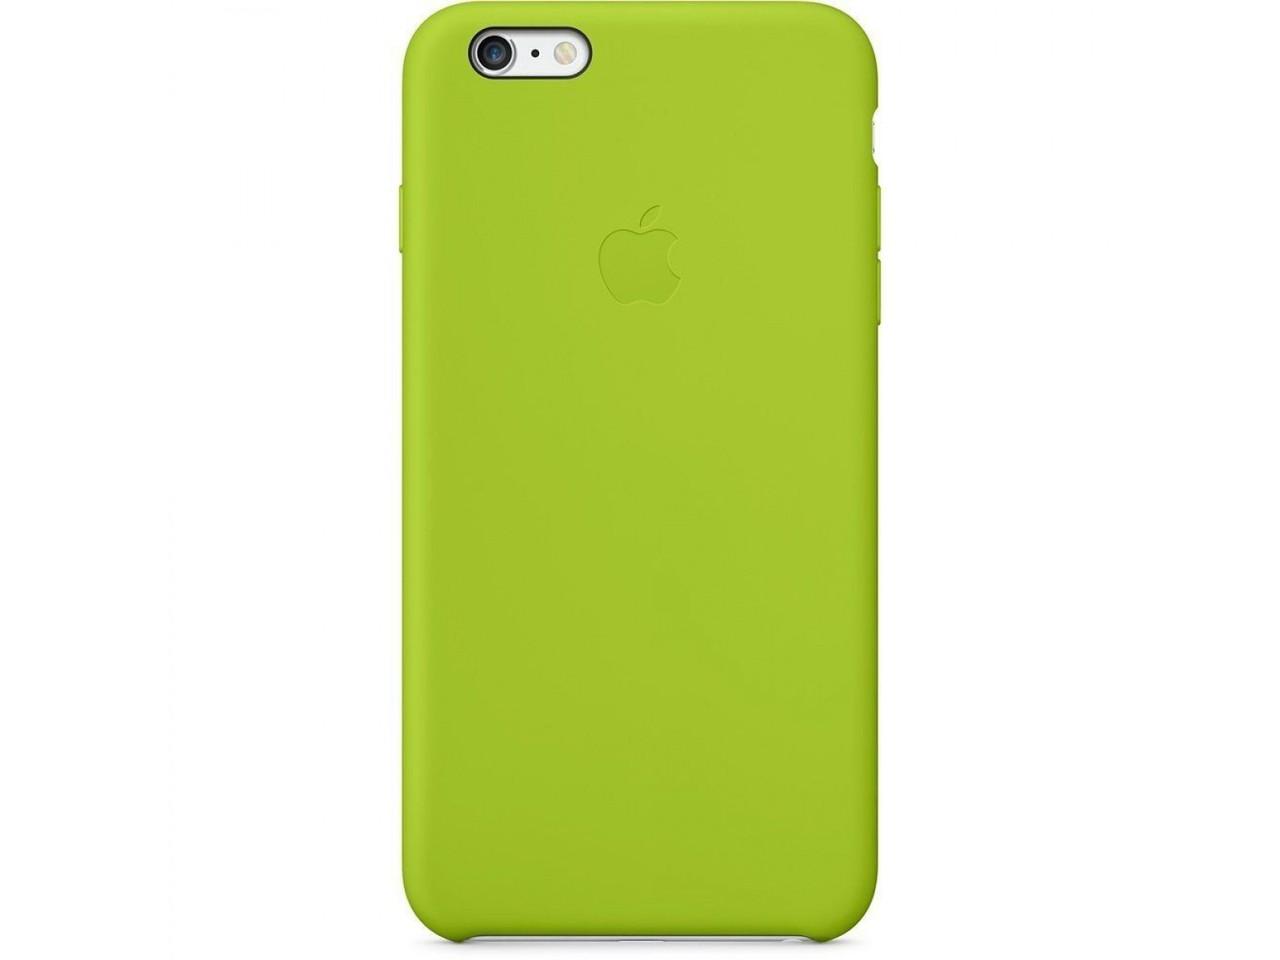 Silicone case Iphone 6/6s Лайм